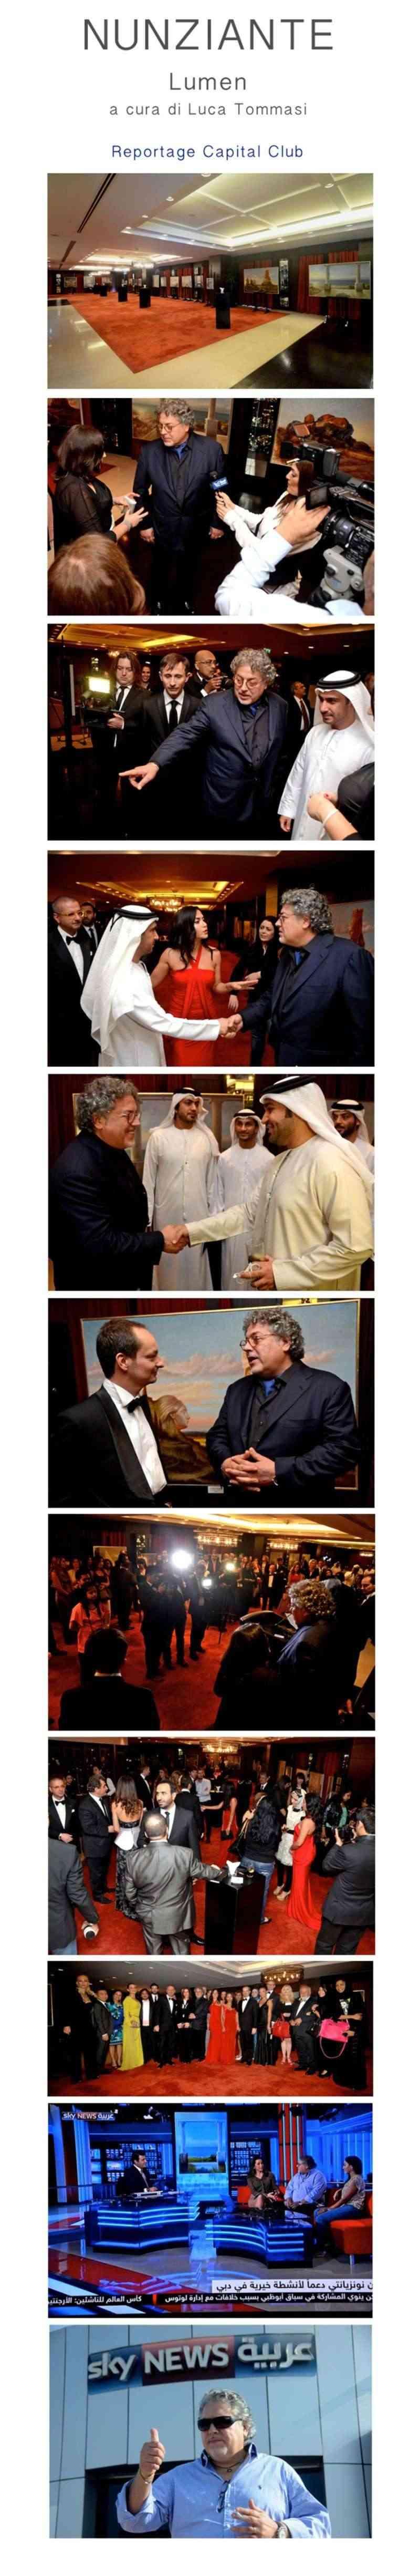 Reportage Capital Club Dubai 13111312